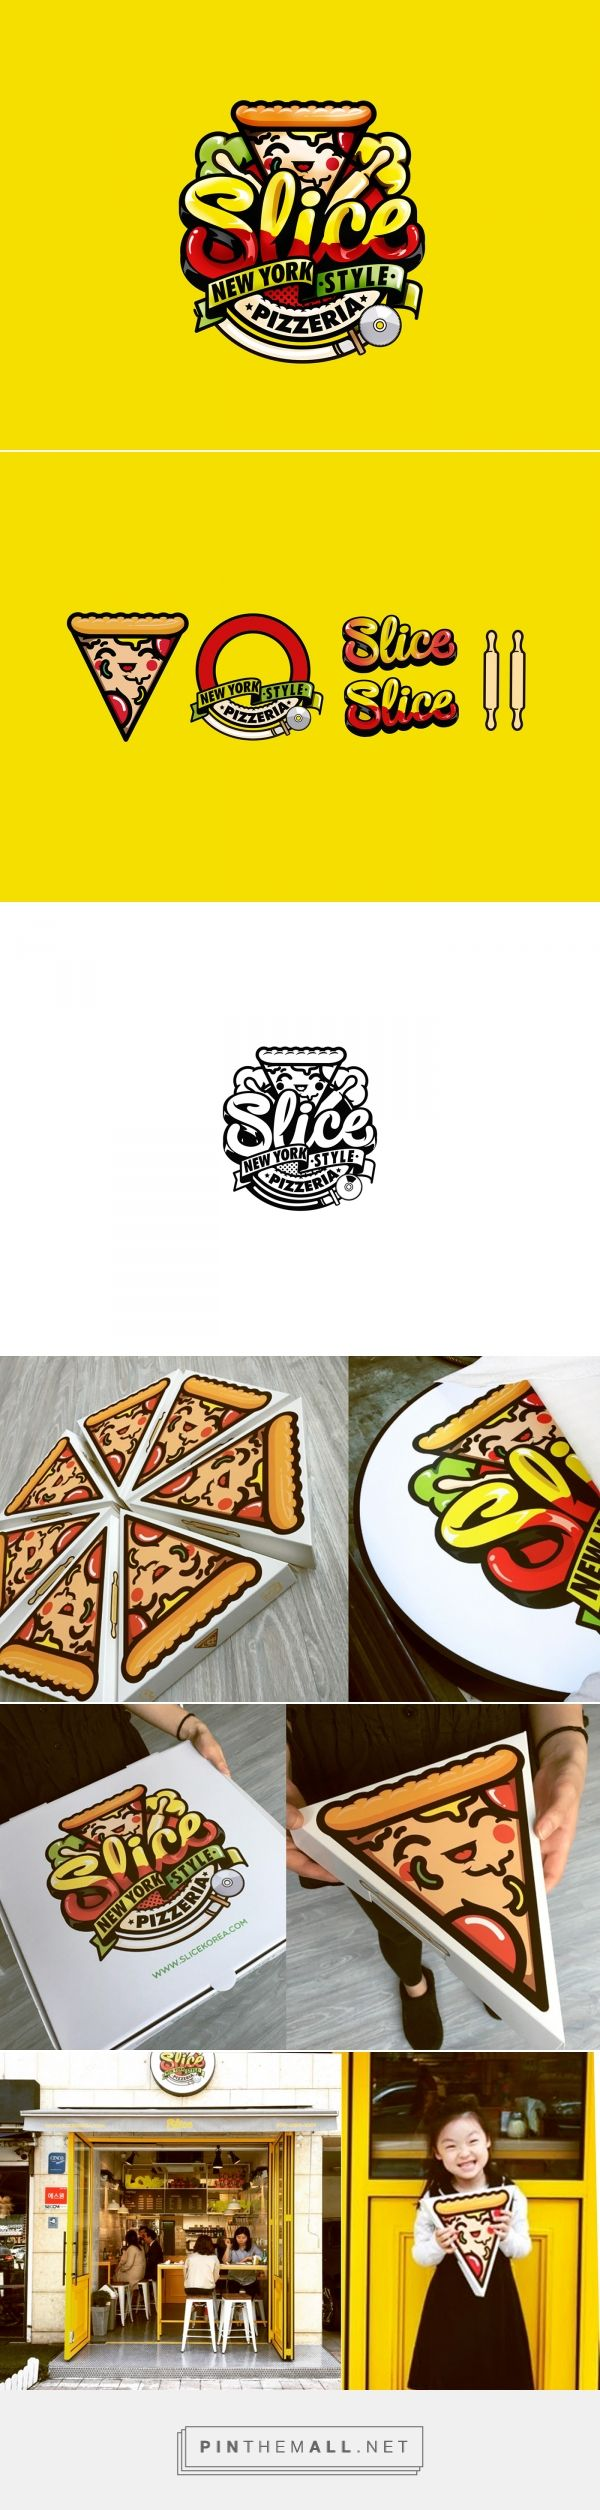 Brand slice pizzeria korea by Chocotoy.